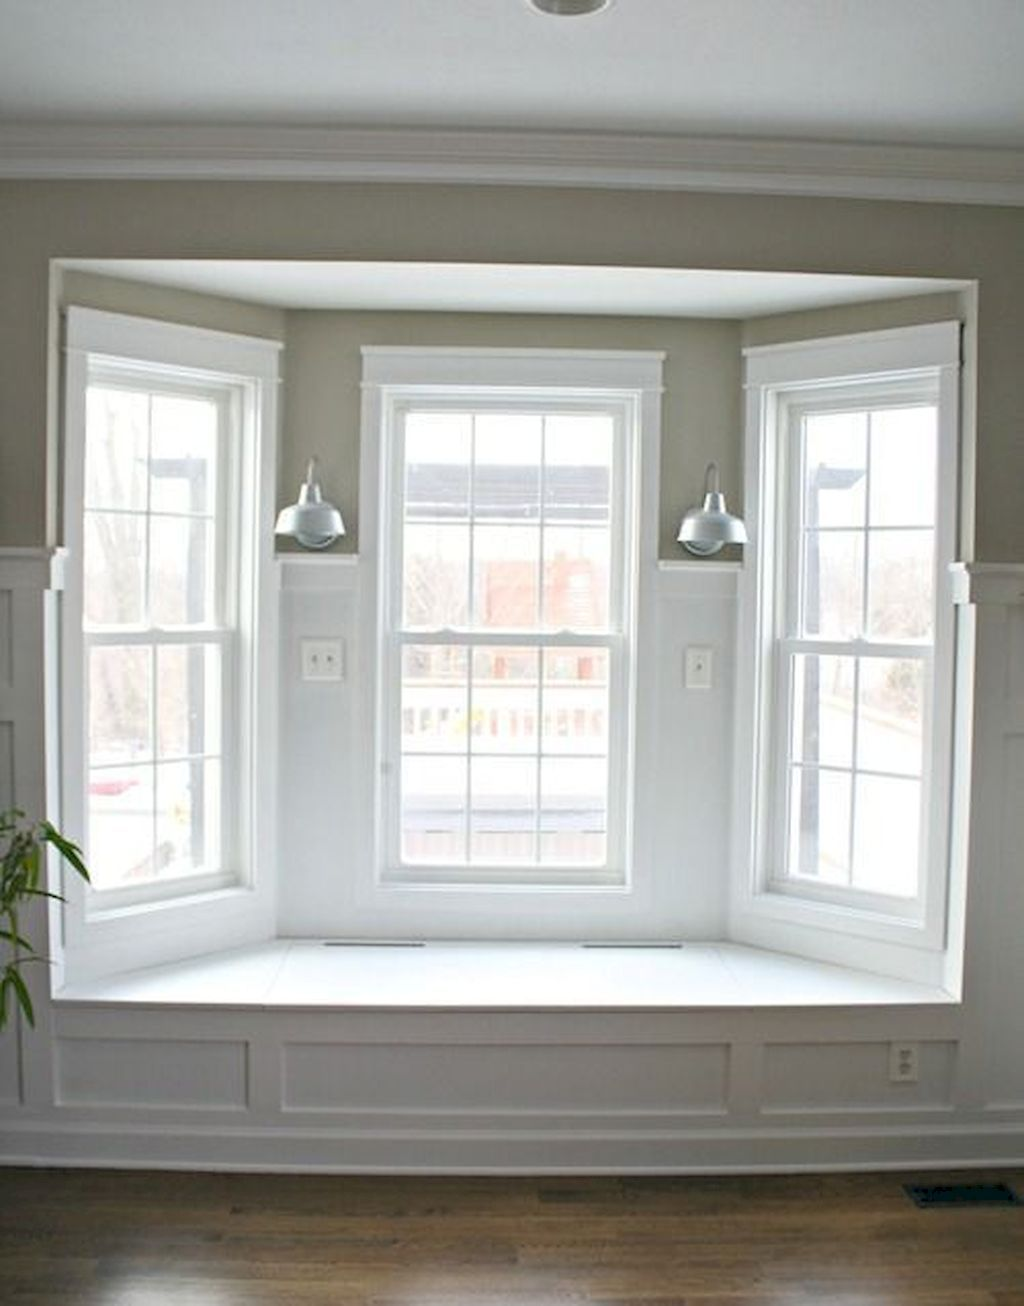 Stunning Window Seat Ideas Home To Z Window Seat Kitchen Bedroom Window Seat Bay Window Benches